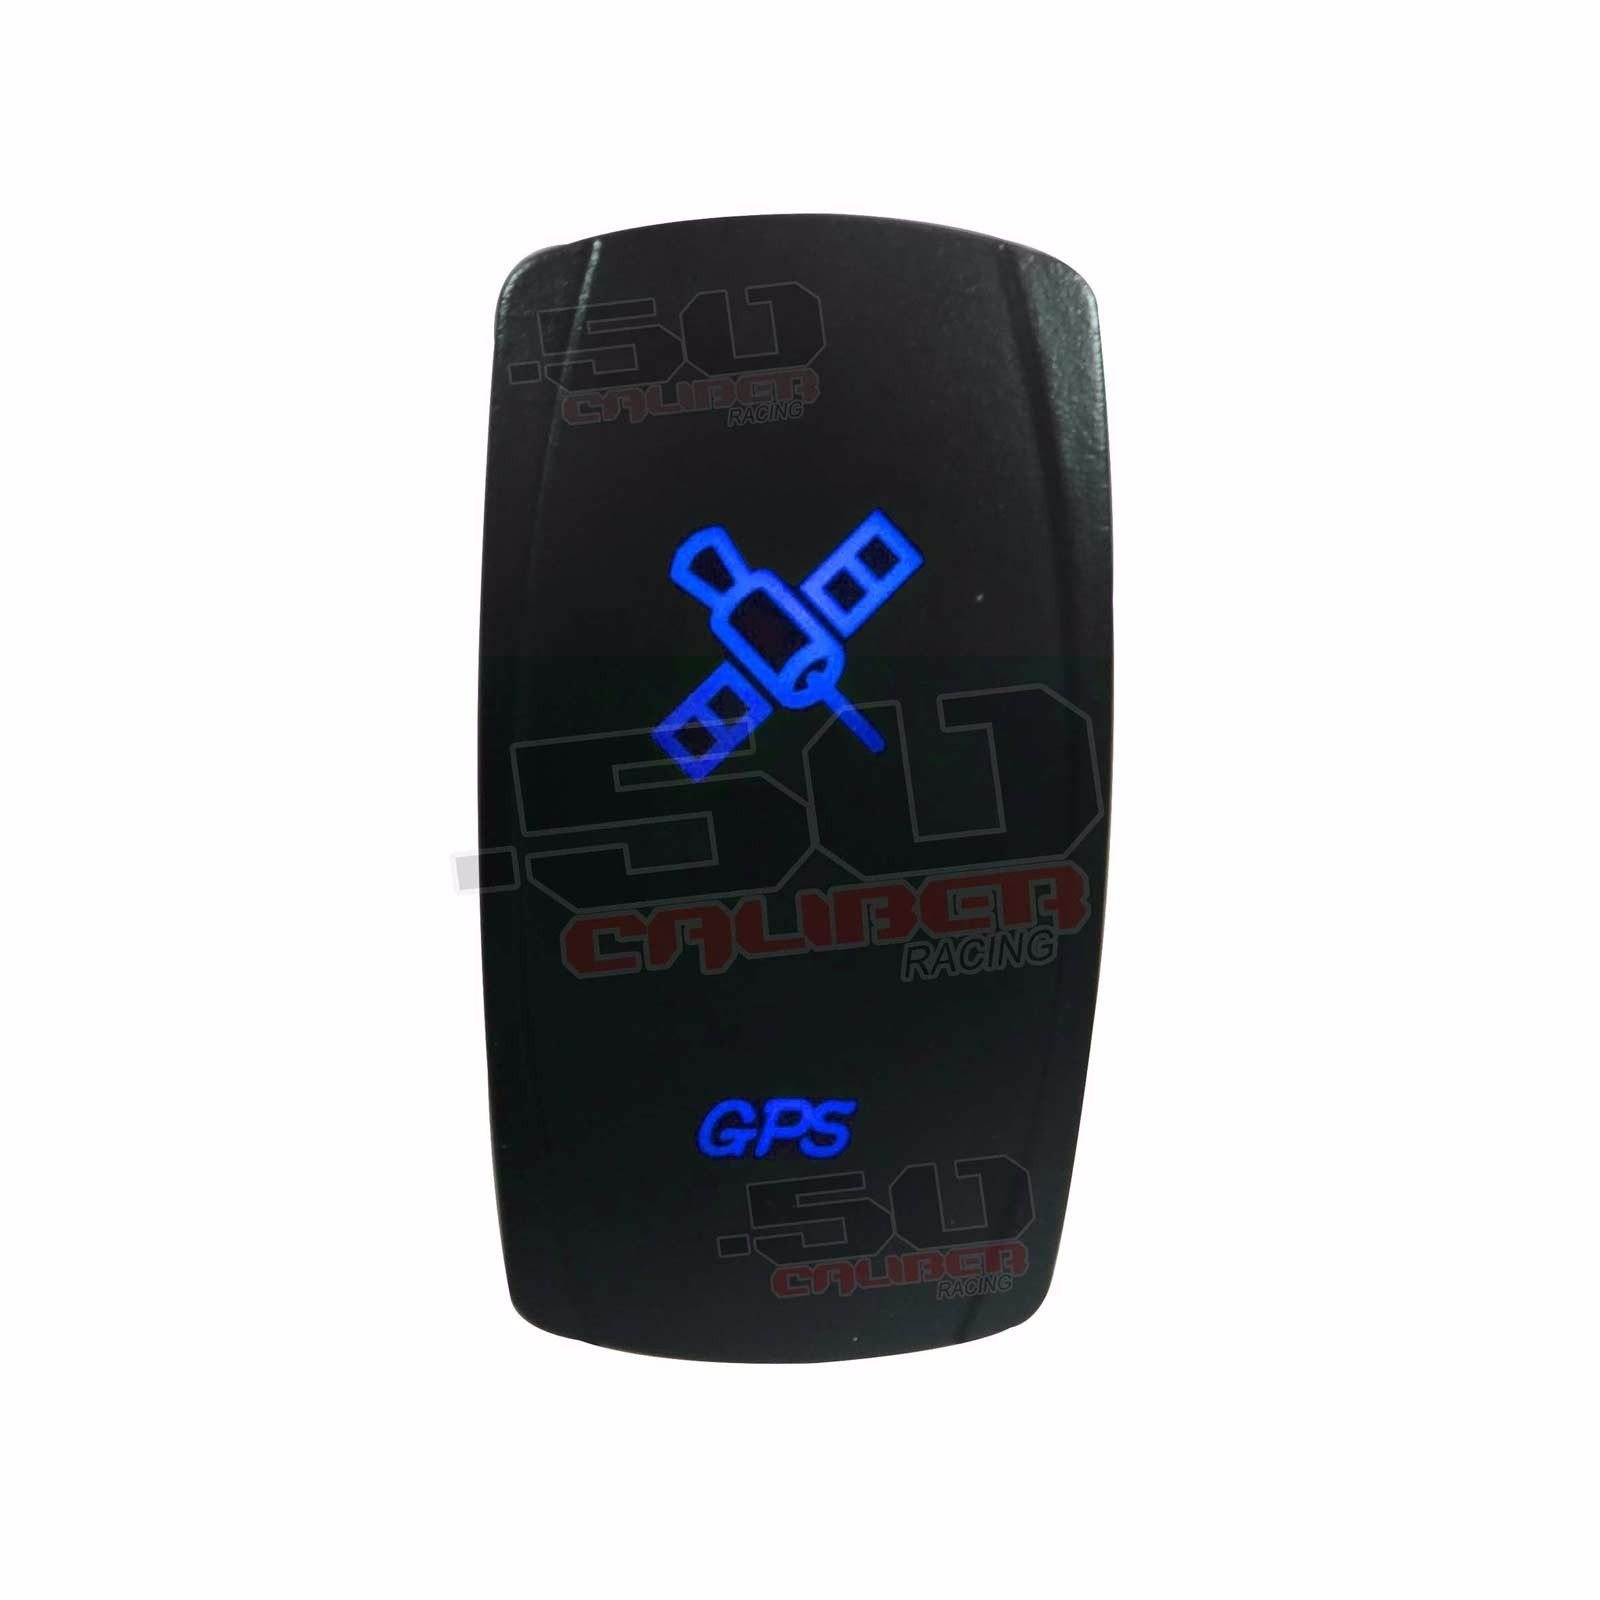 LASER ETCHED 12V LED BACK LIT ROCKER SWITCH BLUE FAN RZR Can Am XP1000 XP4